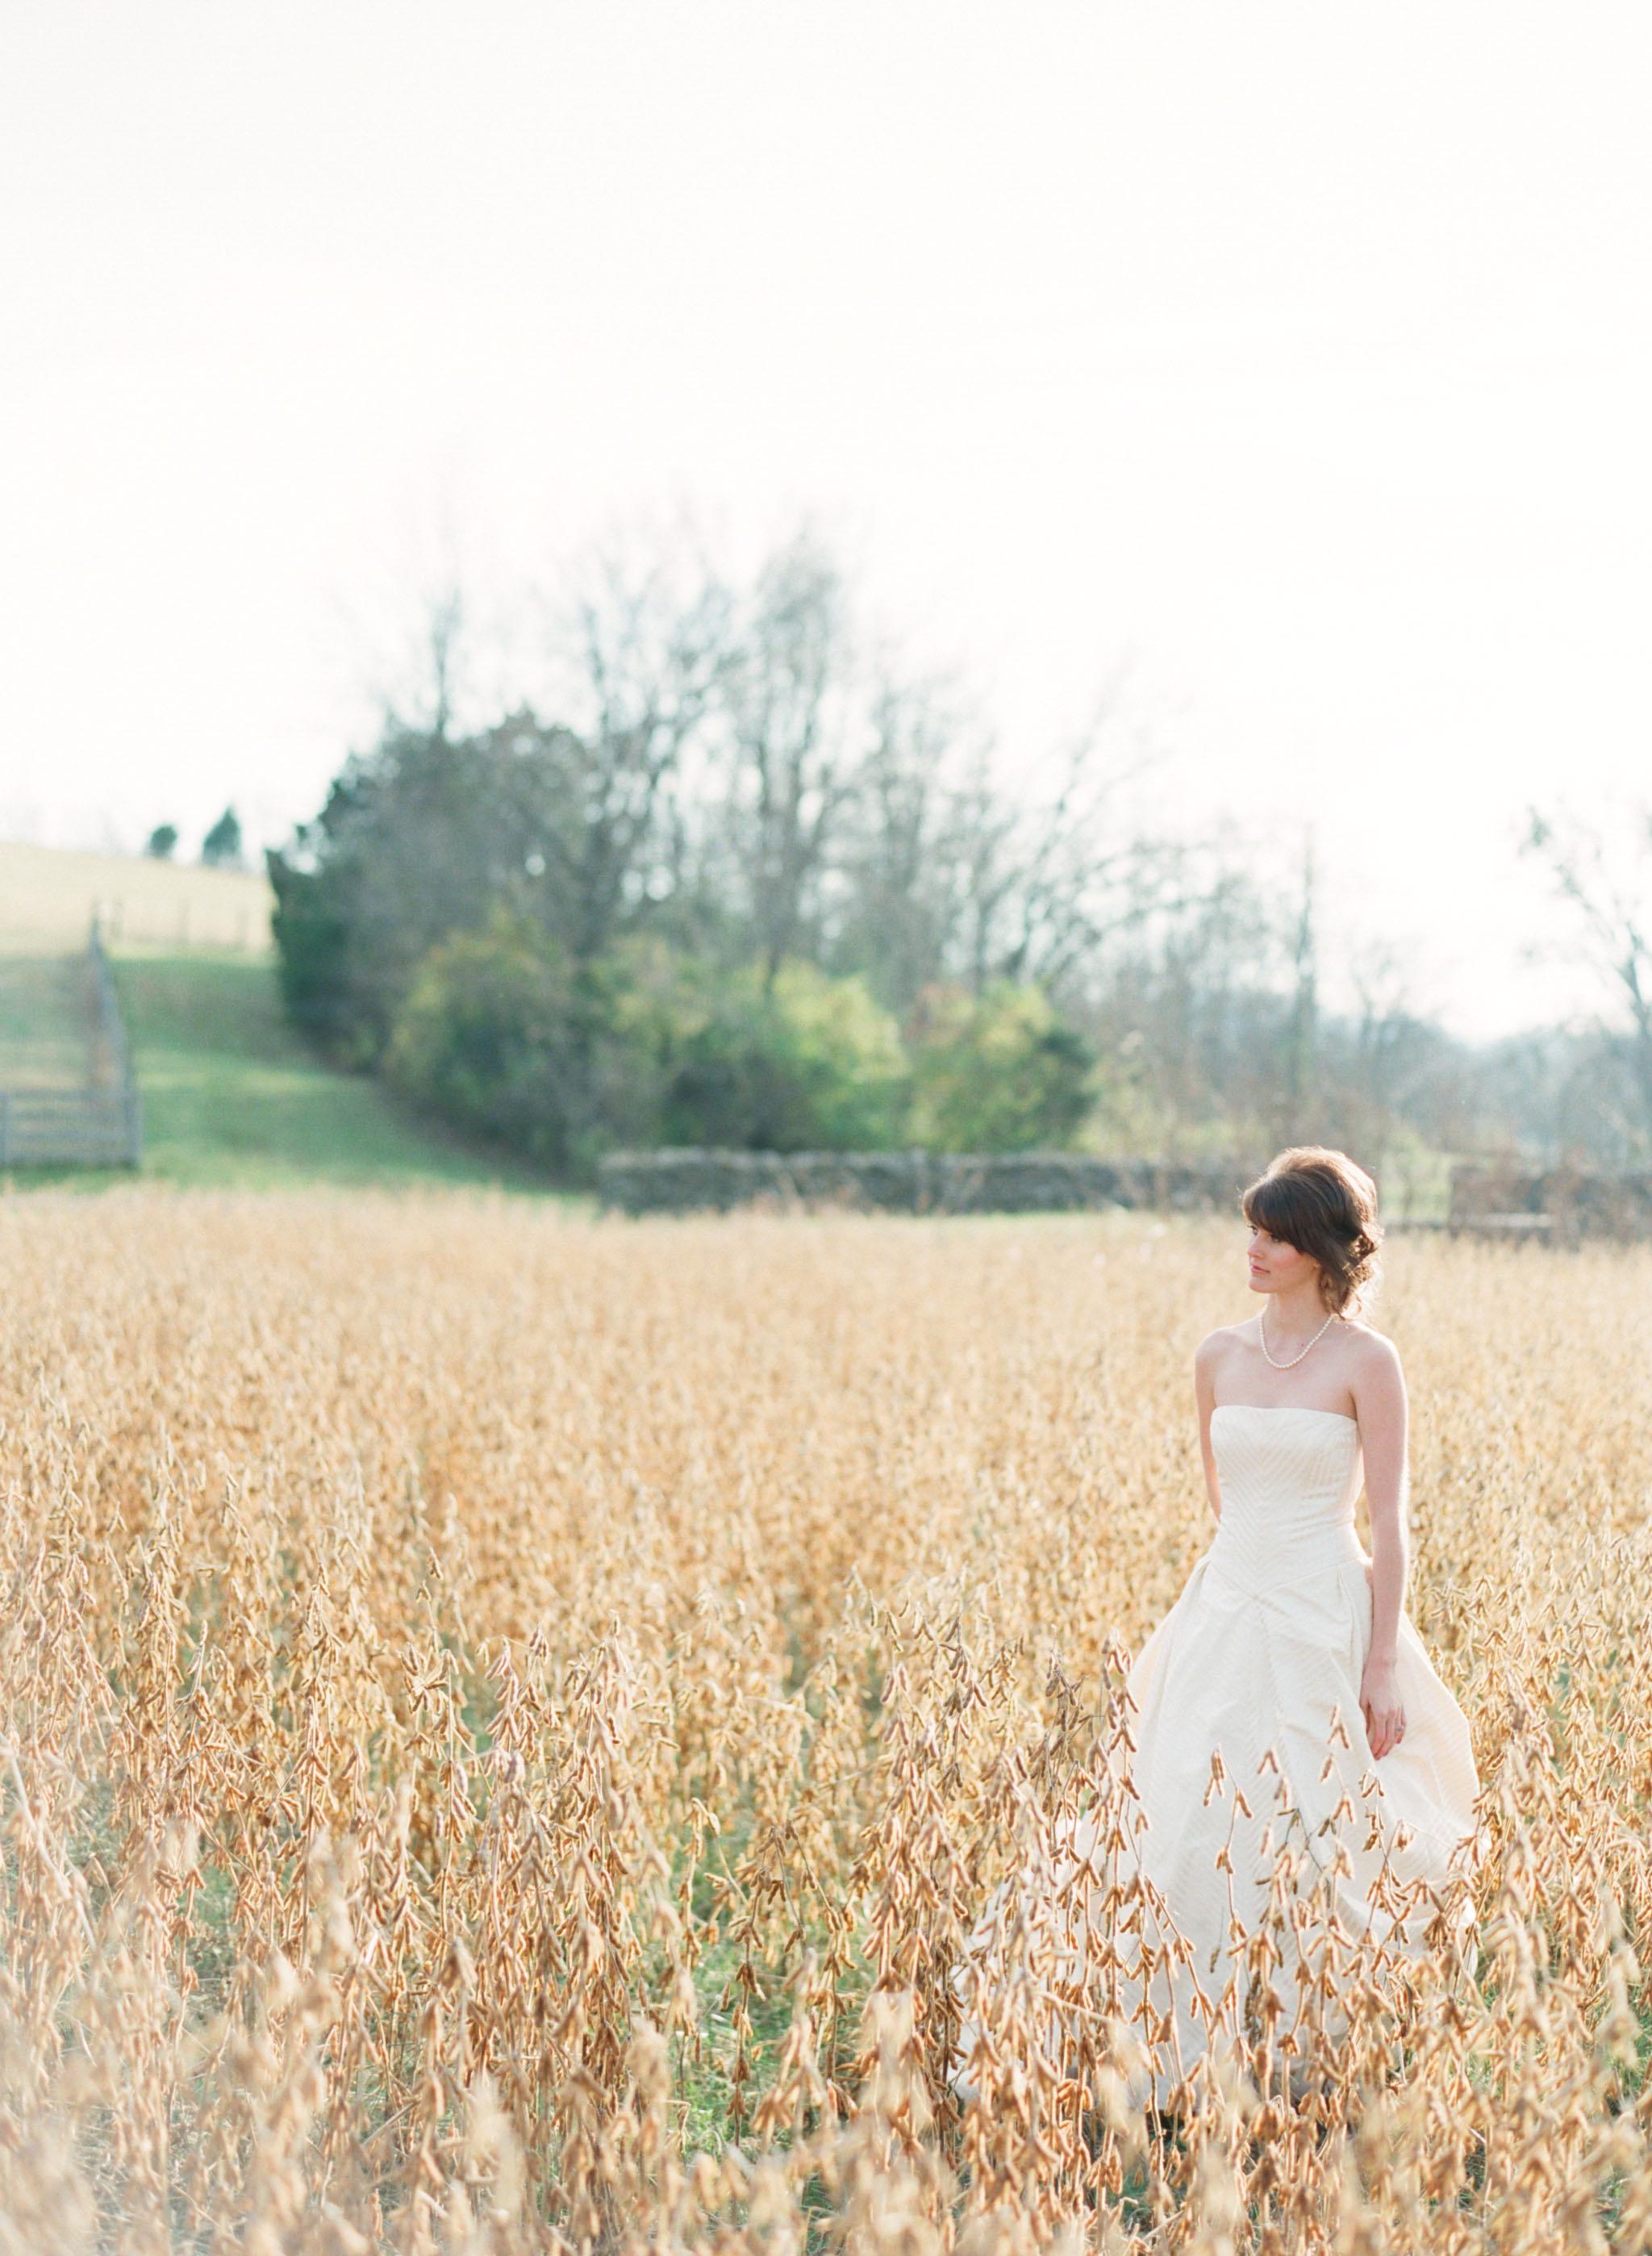 Michelle-Field-Nina _ Wes.jpg